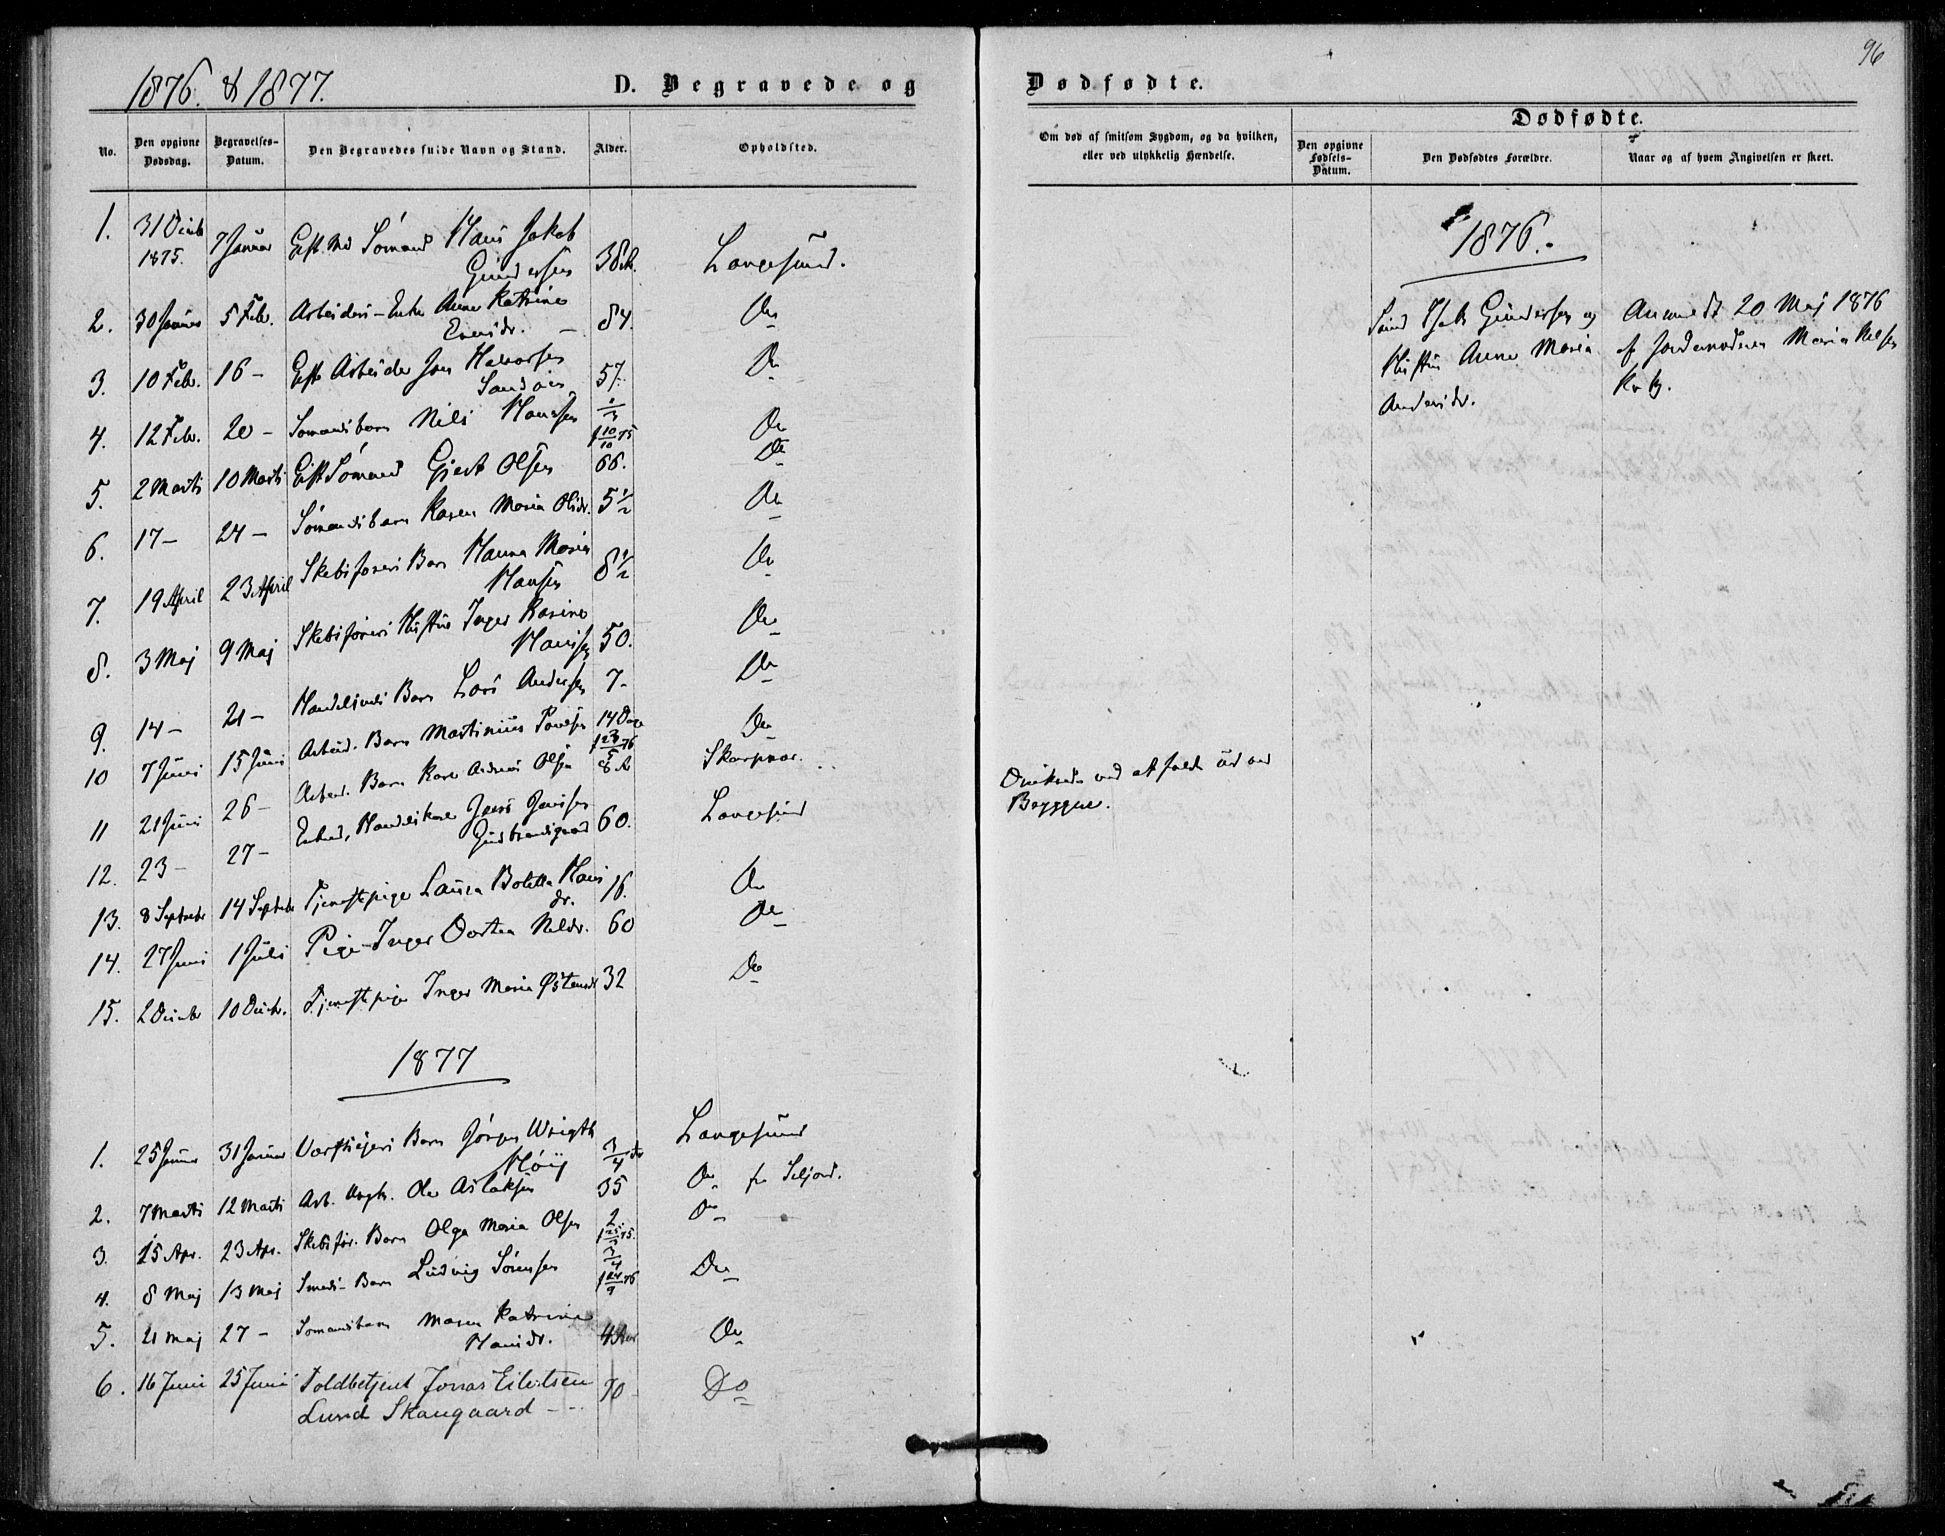 SAKO, Langesund kirkebøker, F/Fa/L0001: Ministerialbok nr. 1, 1870-1877, s. 96